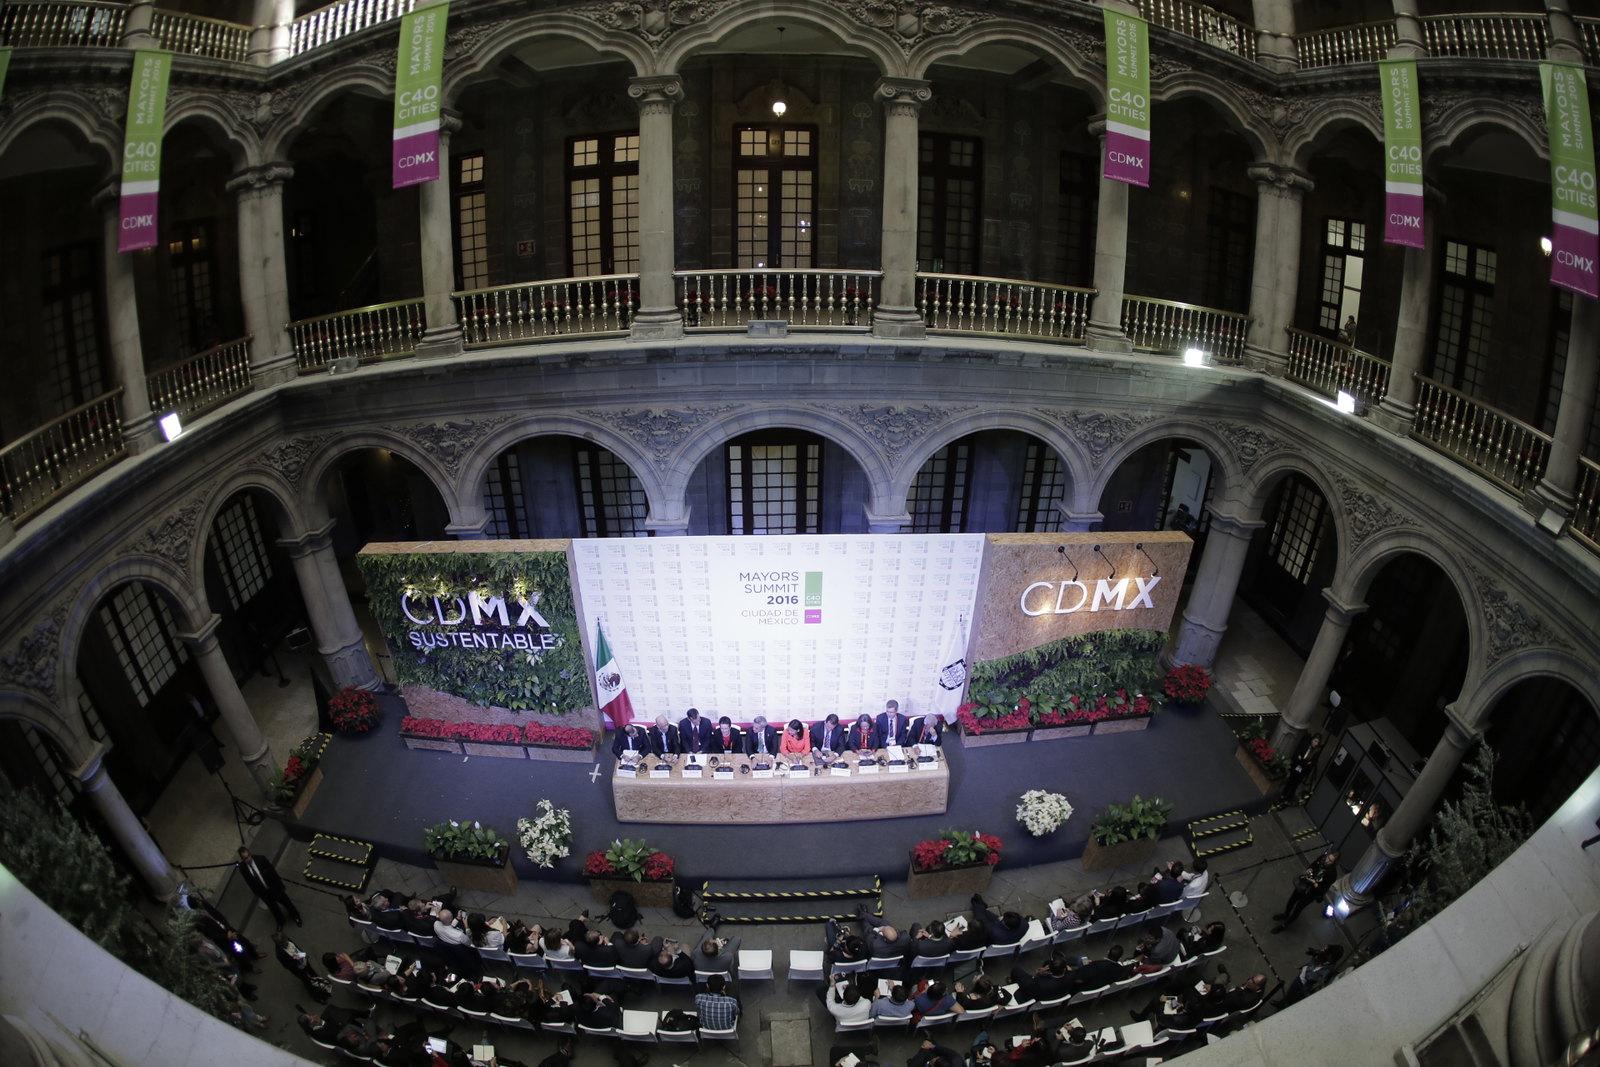 c40 mayors summit cdmx paris agreement cities4climate